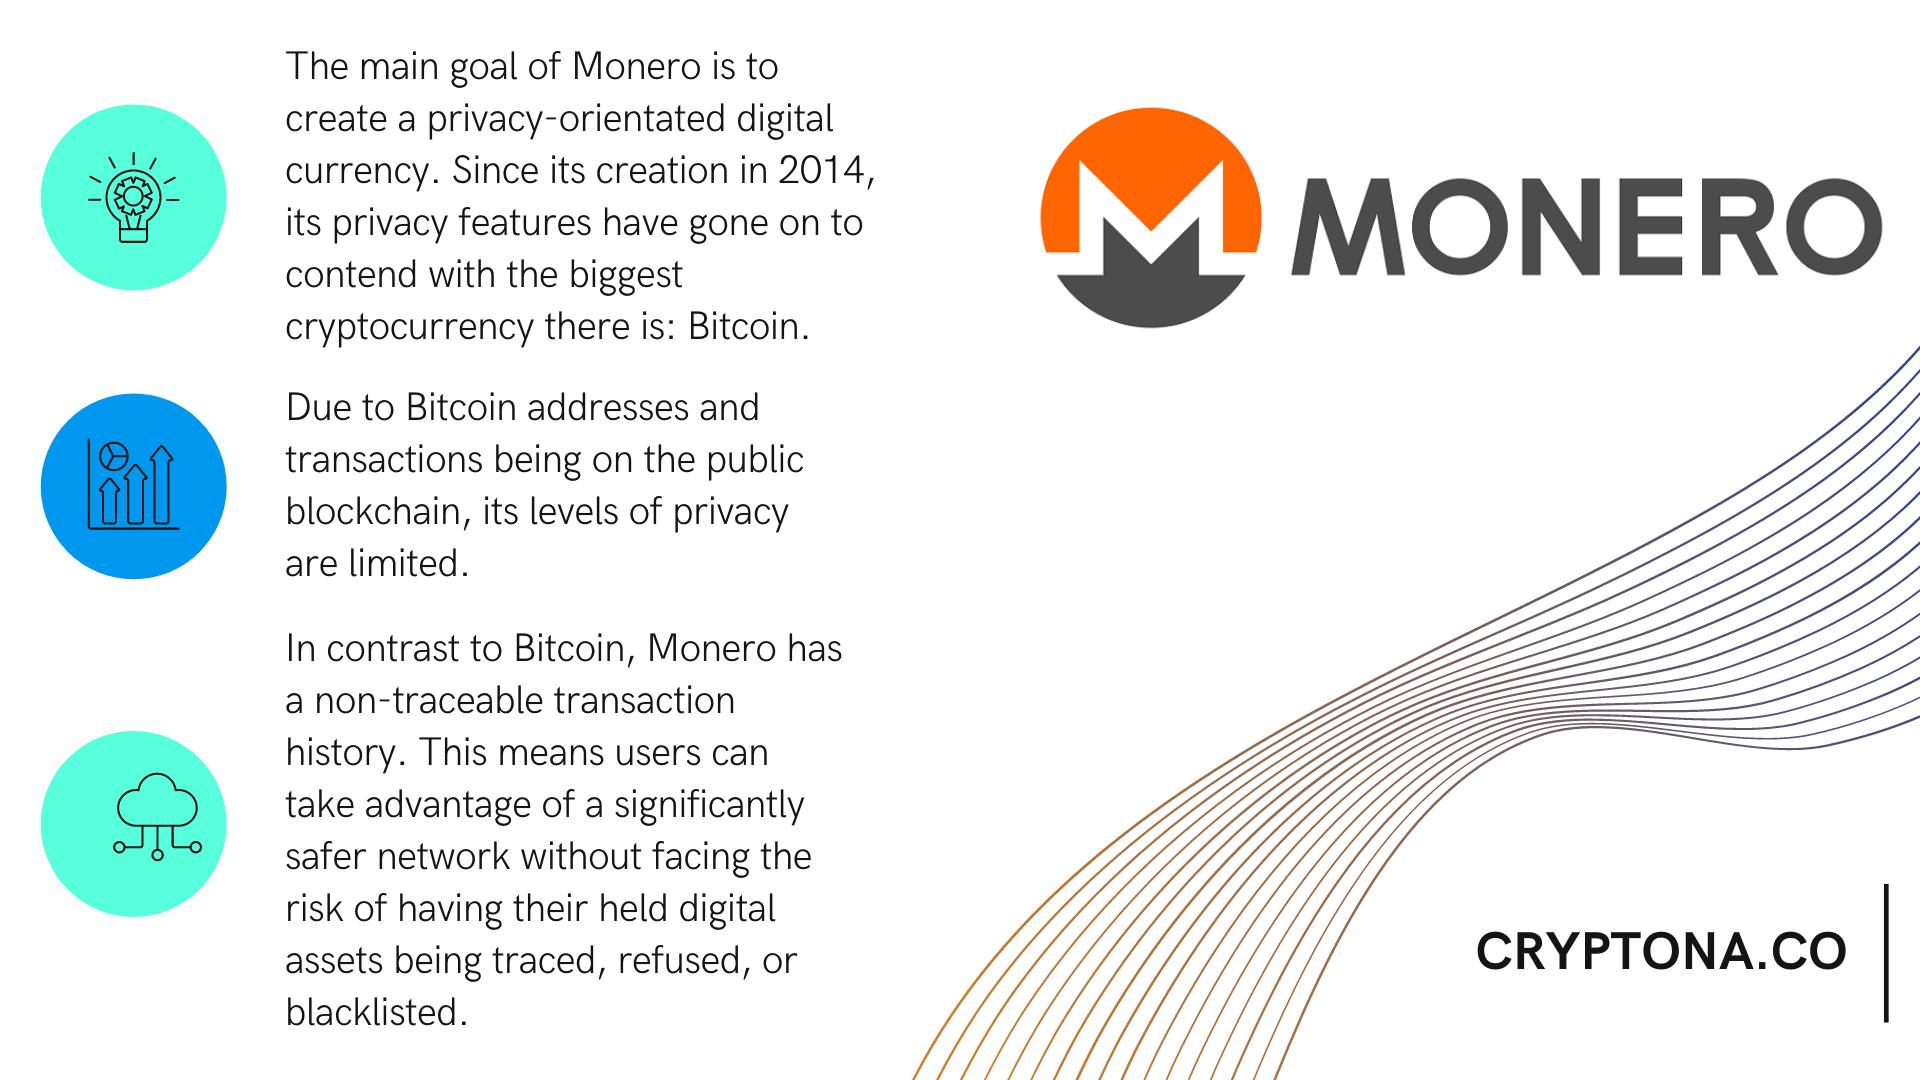 Monero Price Prediction Forecast 2021-2025